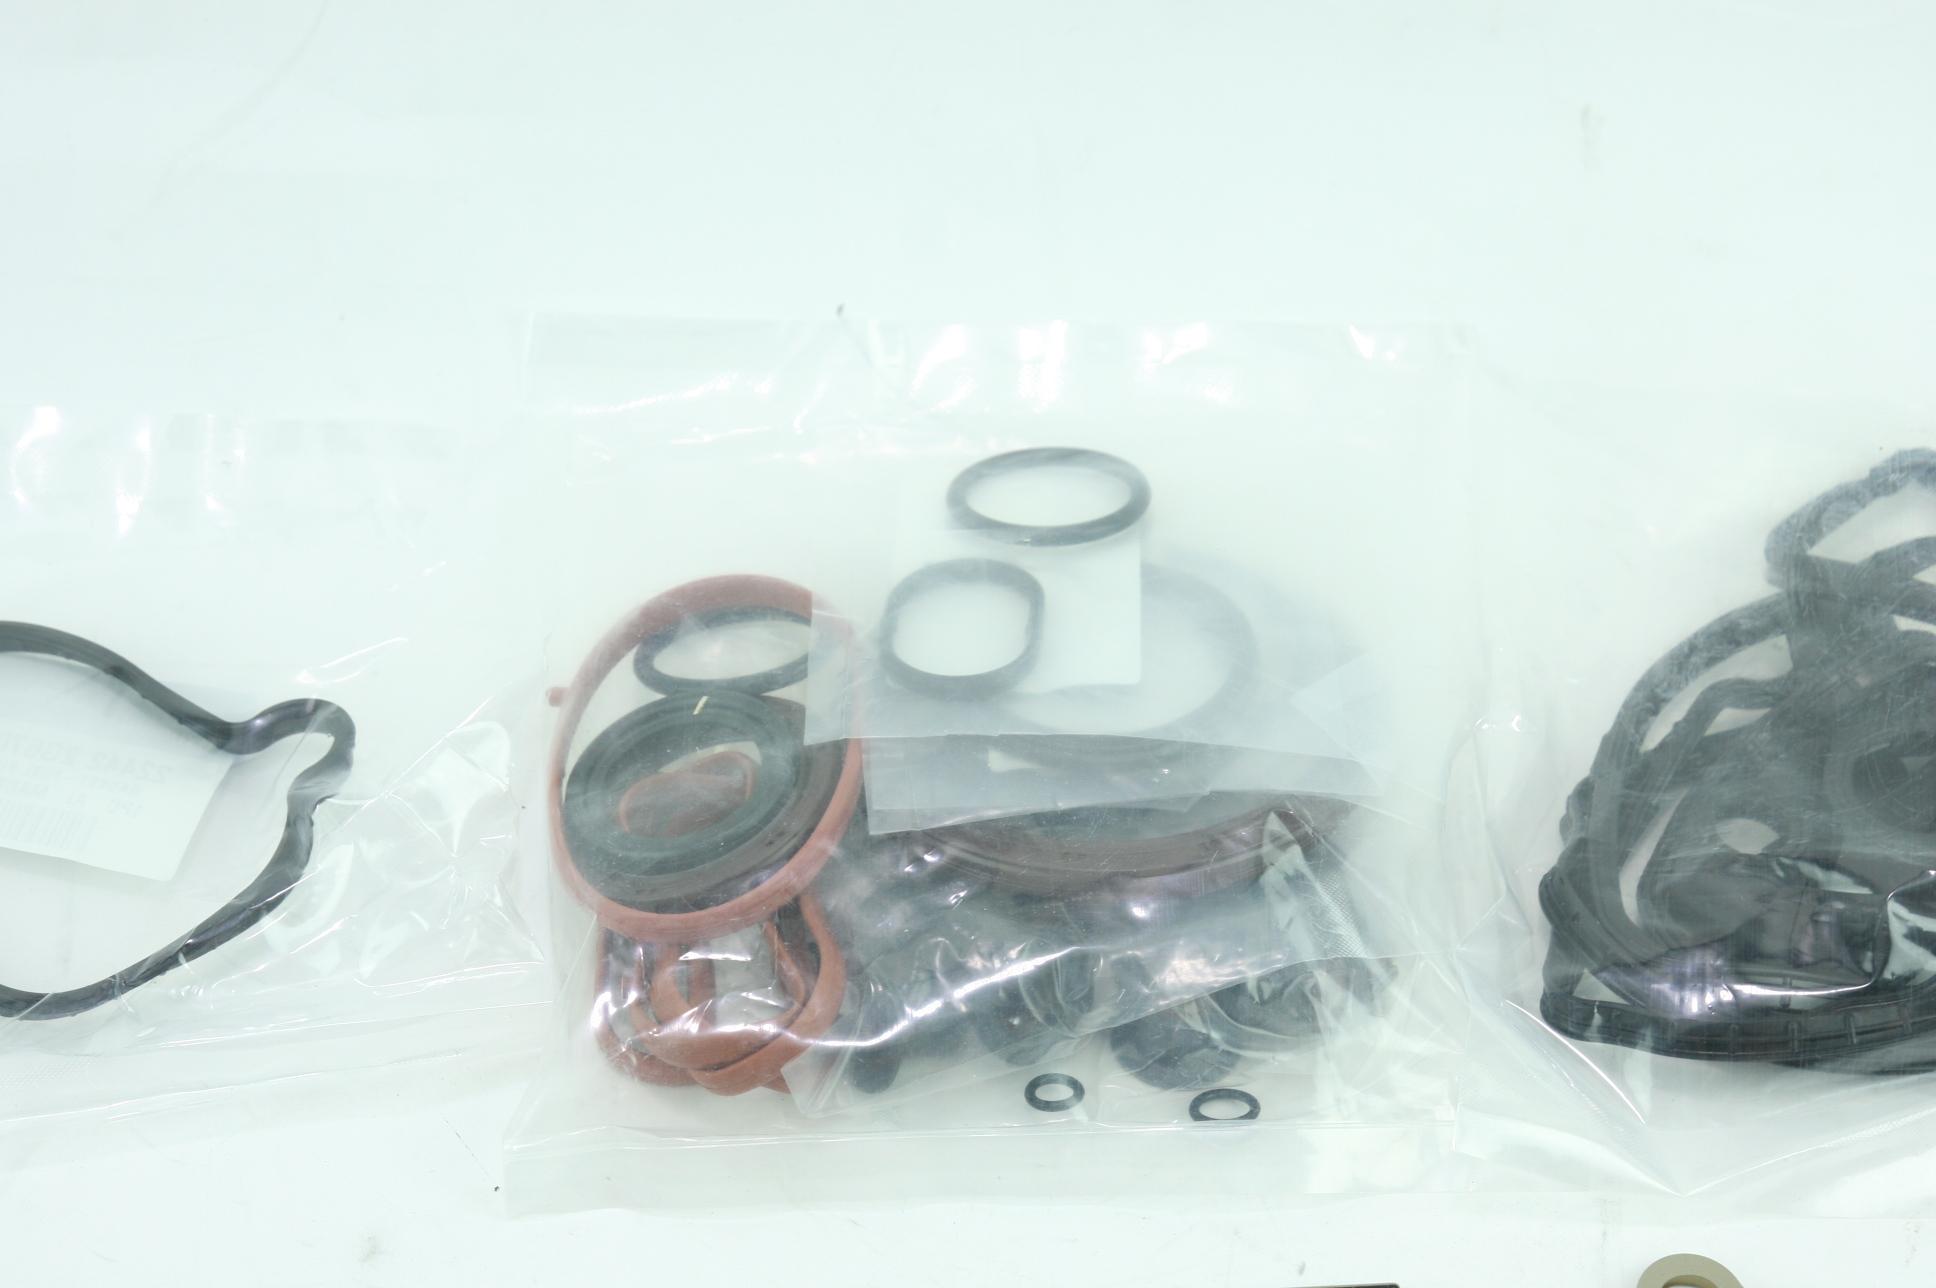 ** New Genuine Hyundai 209102GK03 Full Engine Overhaul Gasket Set Free Shipping - image 4